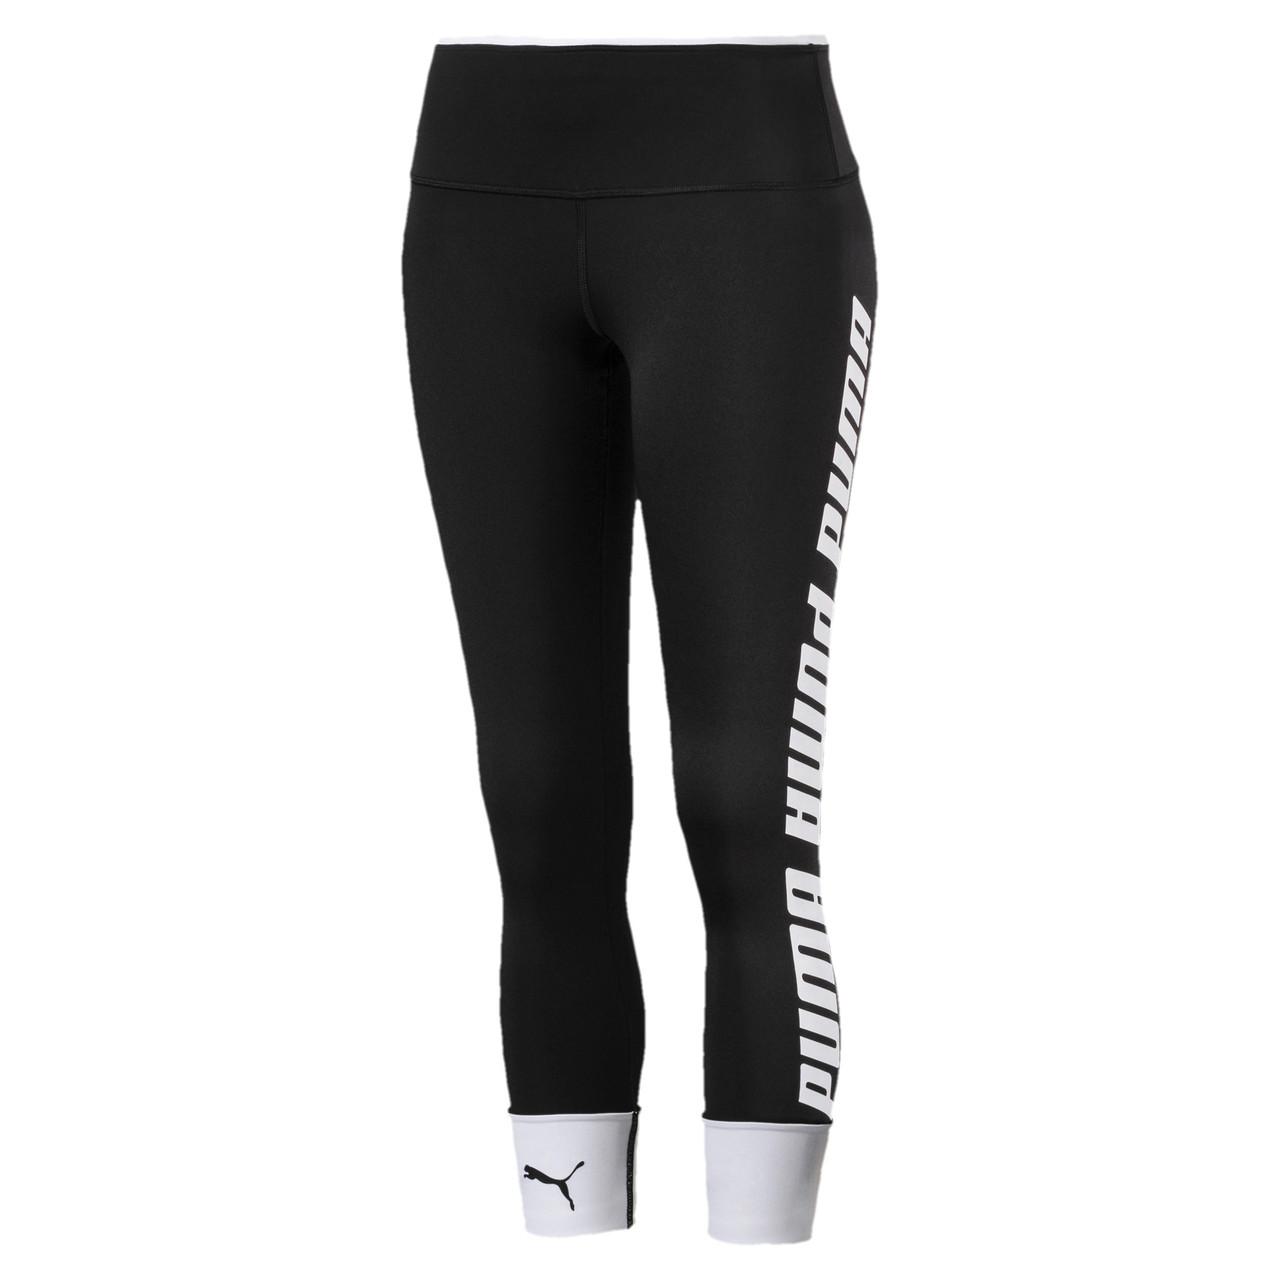 Женские Леггинсы Modern Sports Fold Up Legging